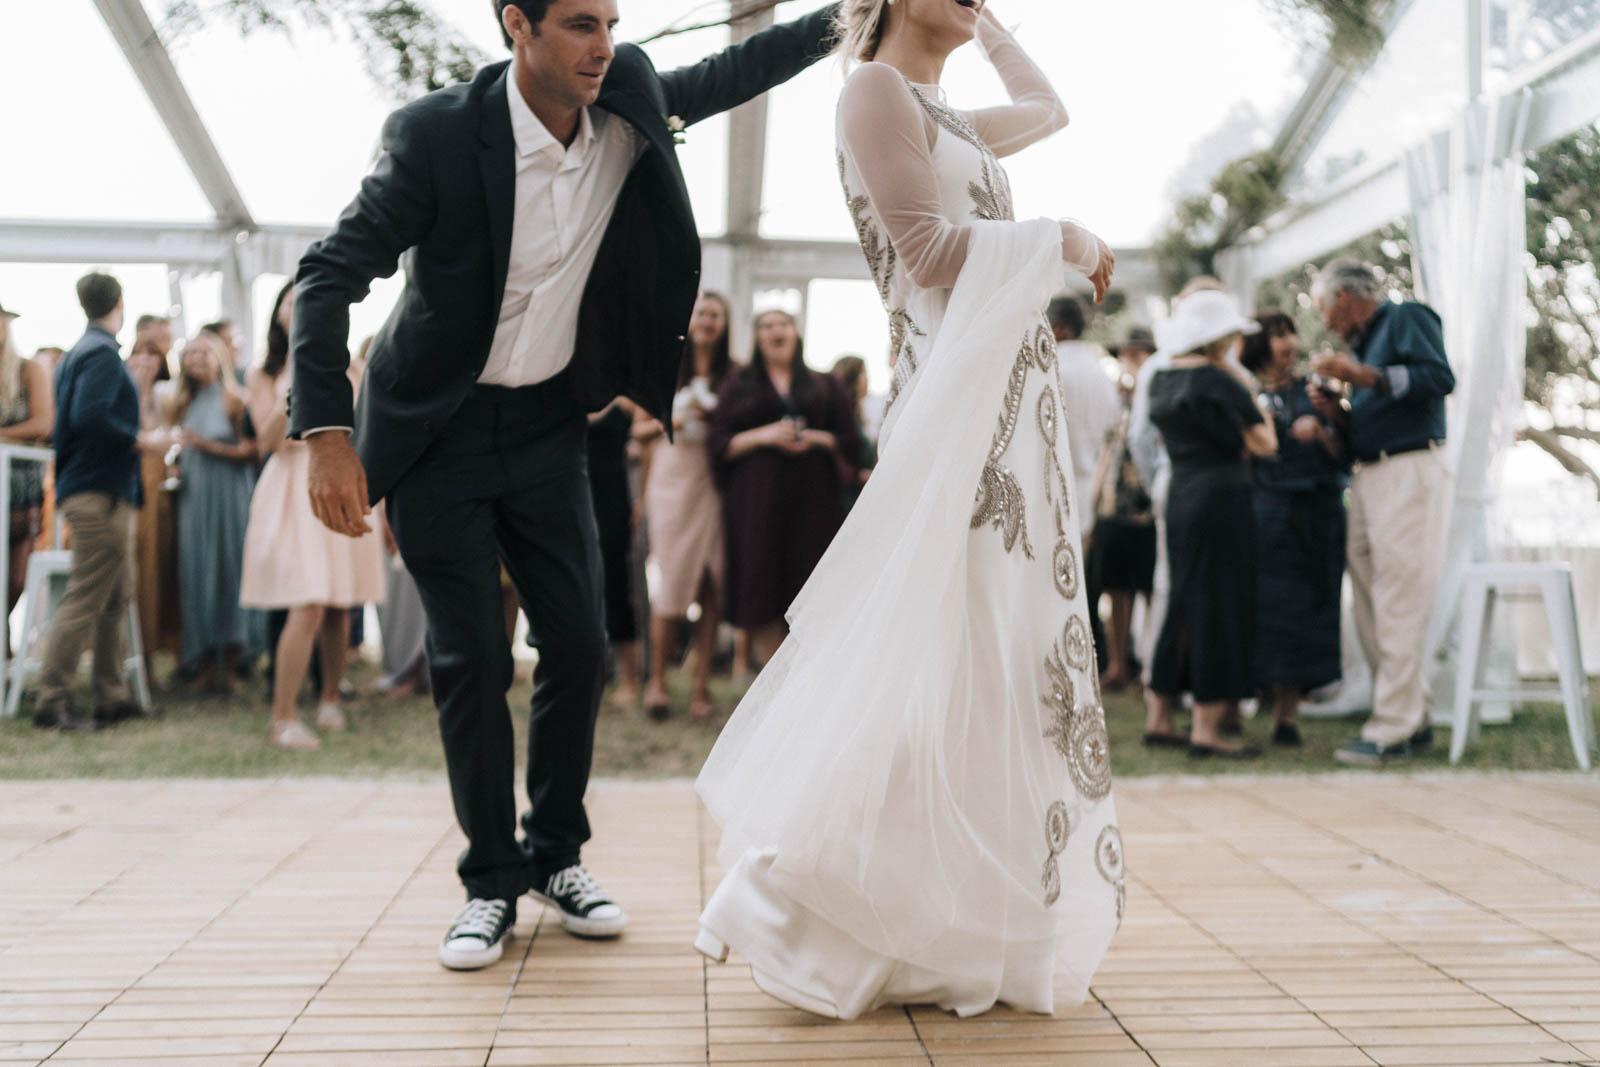 newfound-l-i-coromandel-wedding-photographer-2003-A9_05581